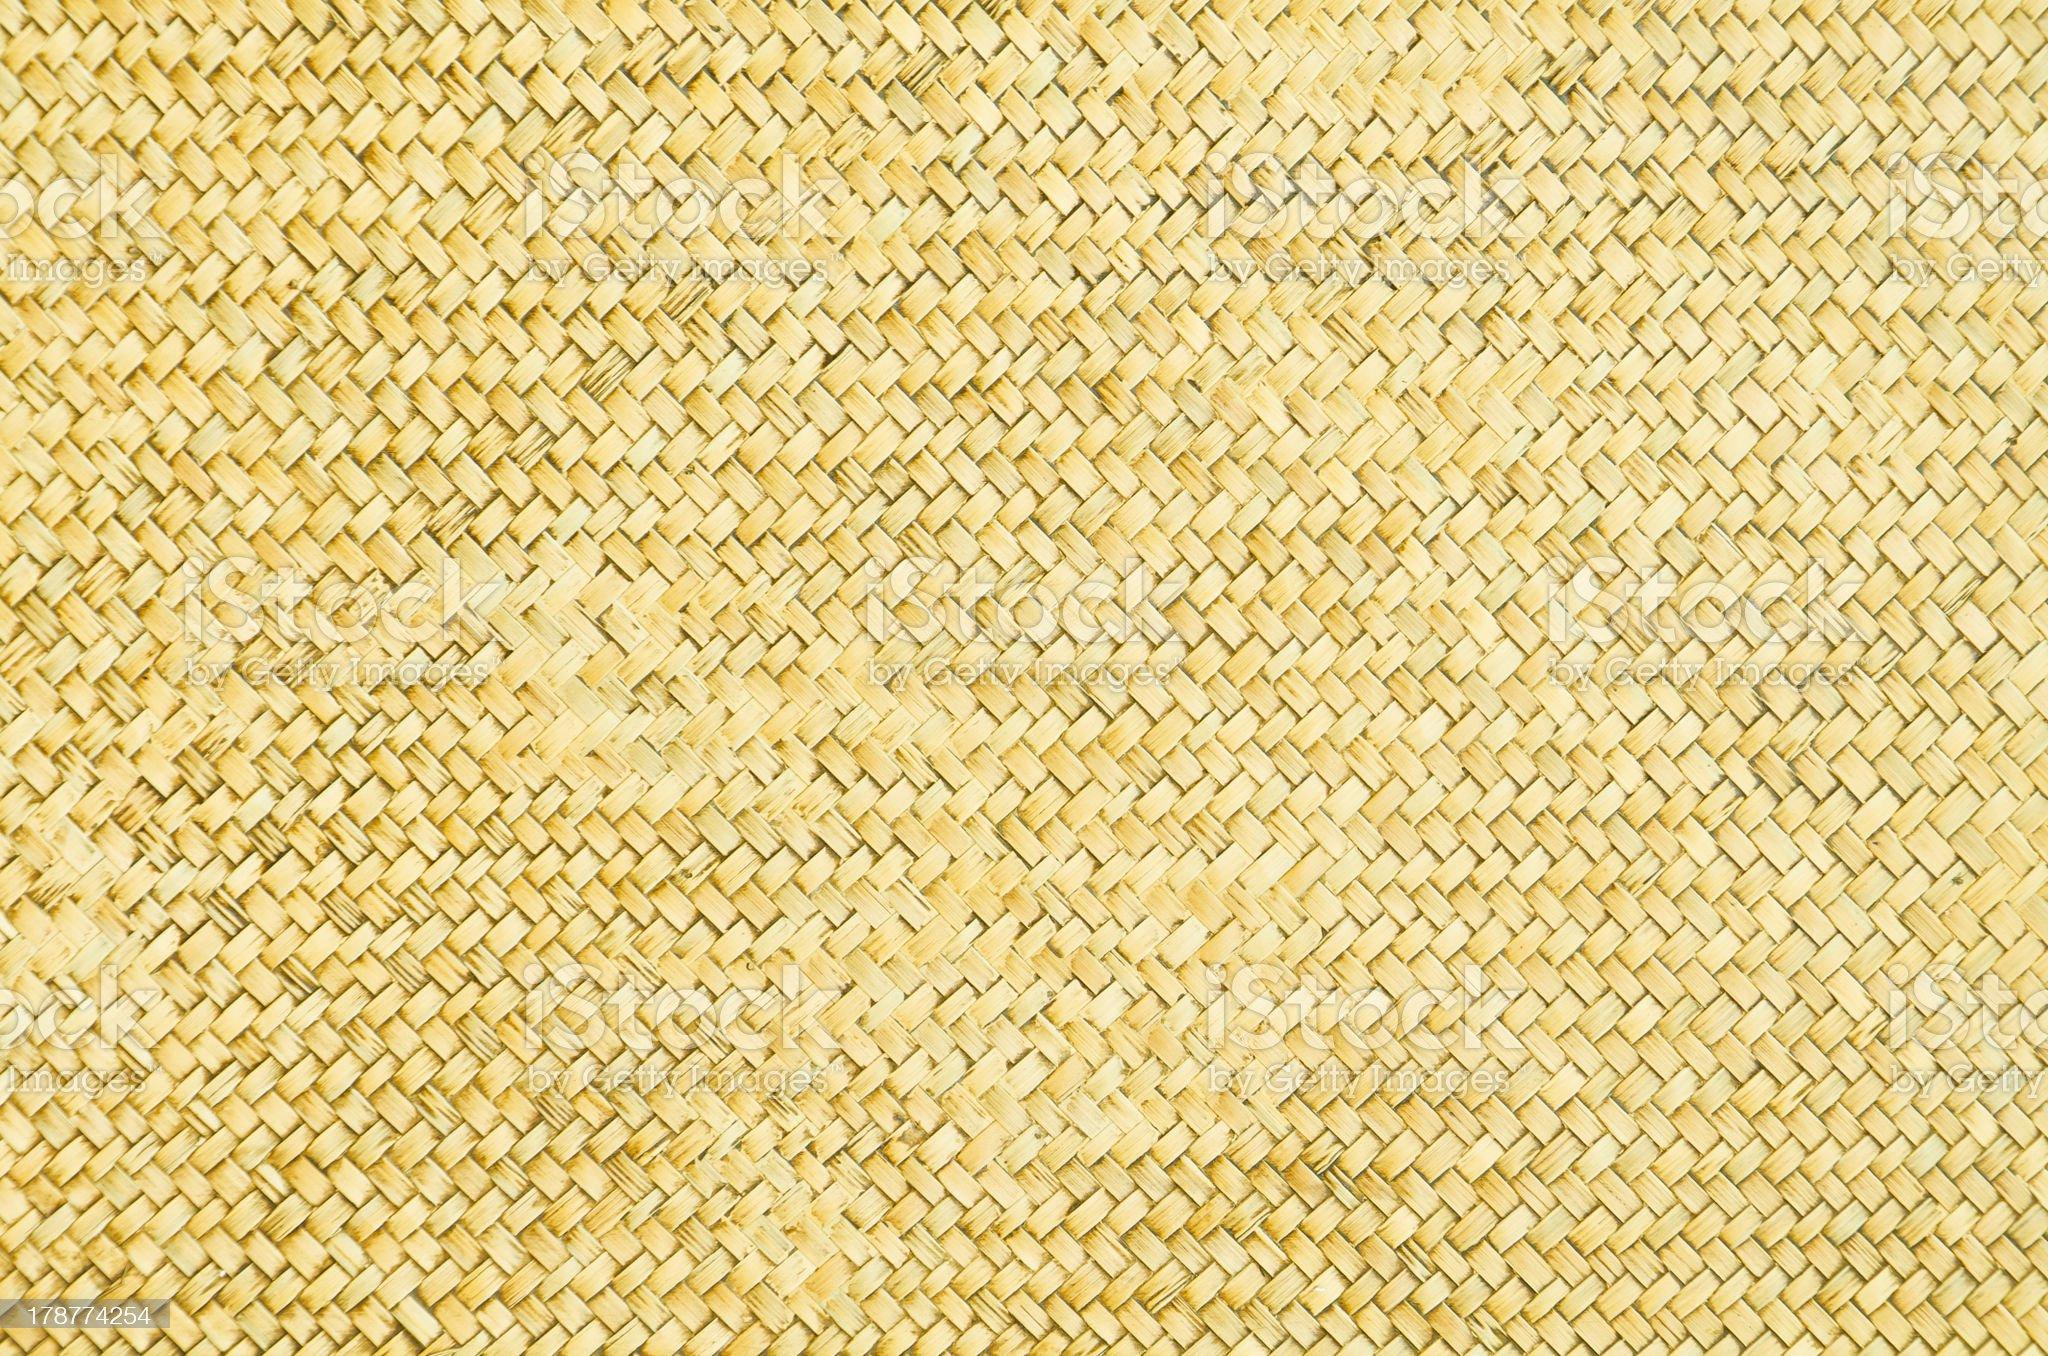 old, grunge bamboo wall royalty-free stock photo